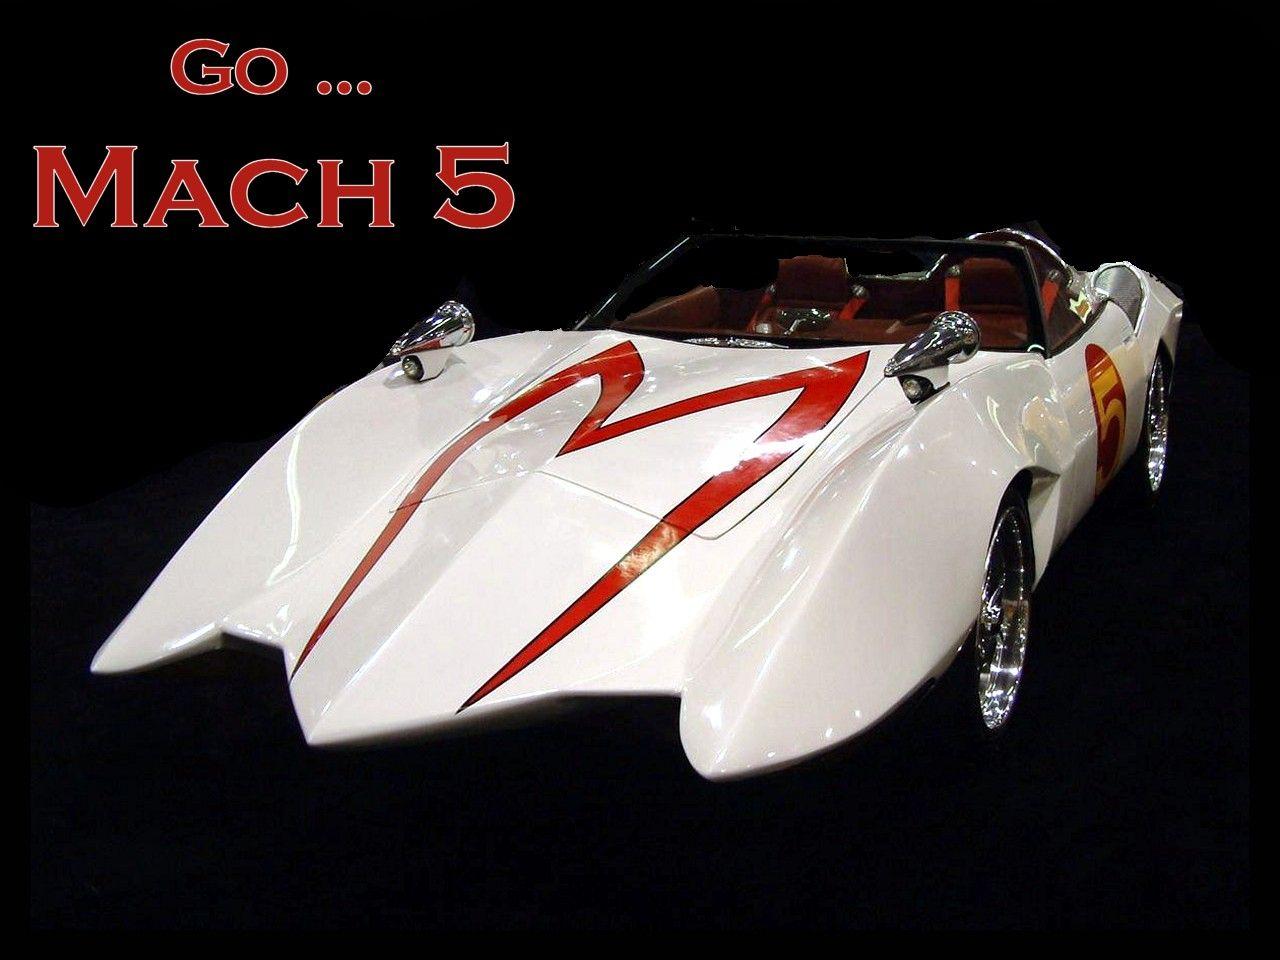 Racer x mach 5 mach 5 speed racer car by puddlz on deviantart